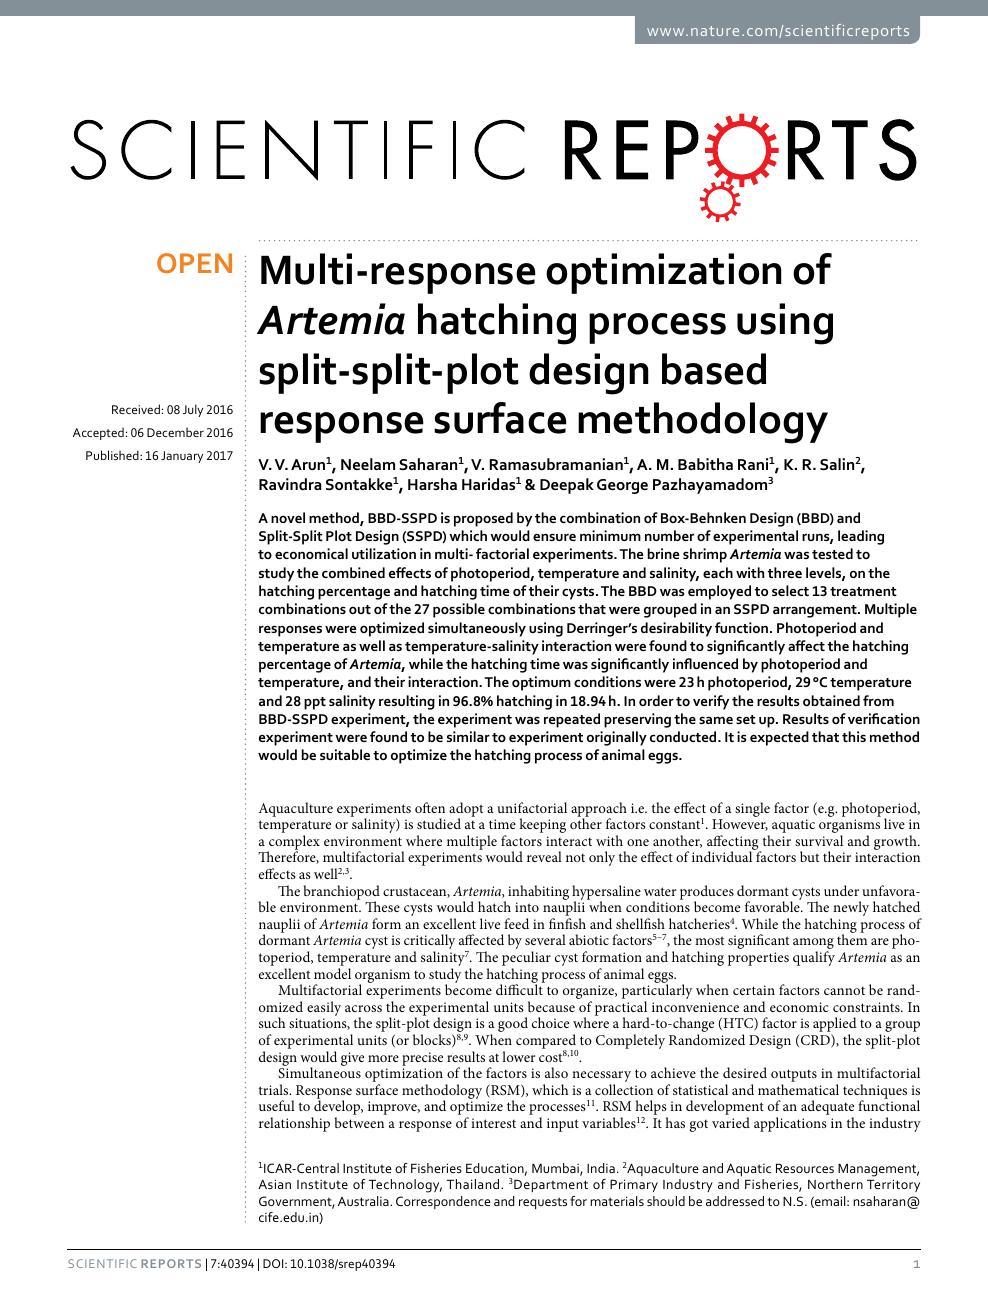 Multi-response optimization of Artemia hatching process